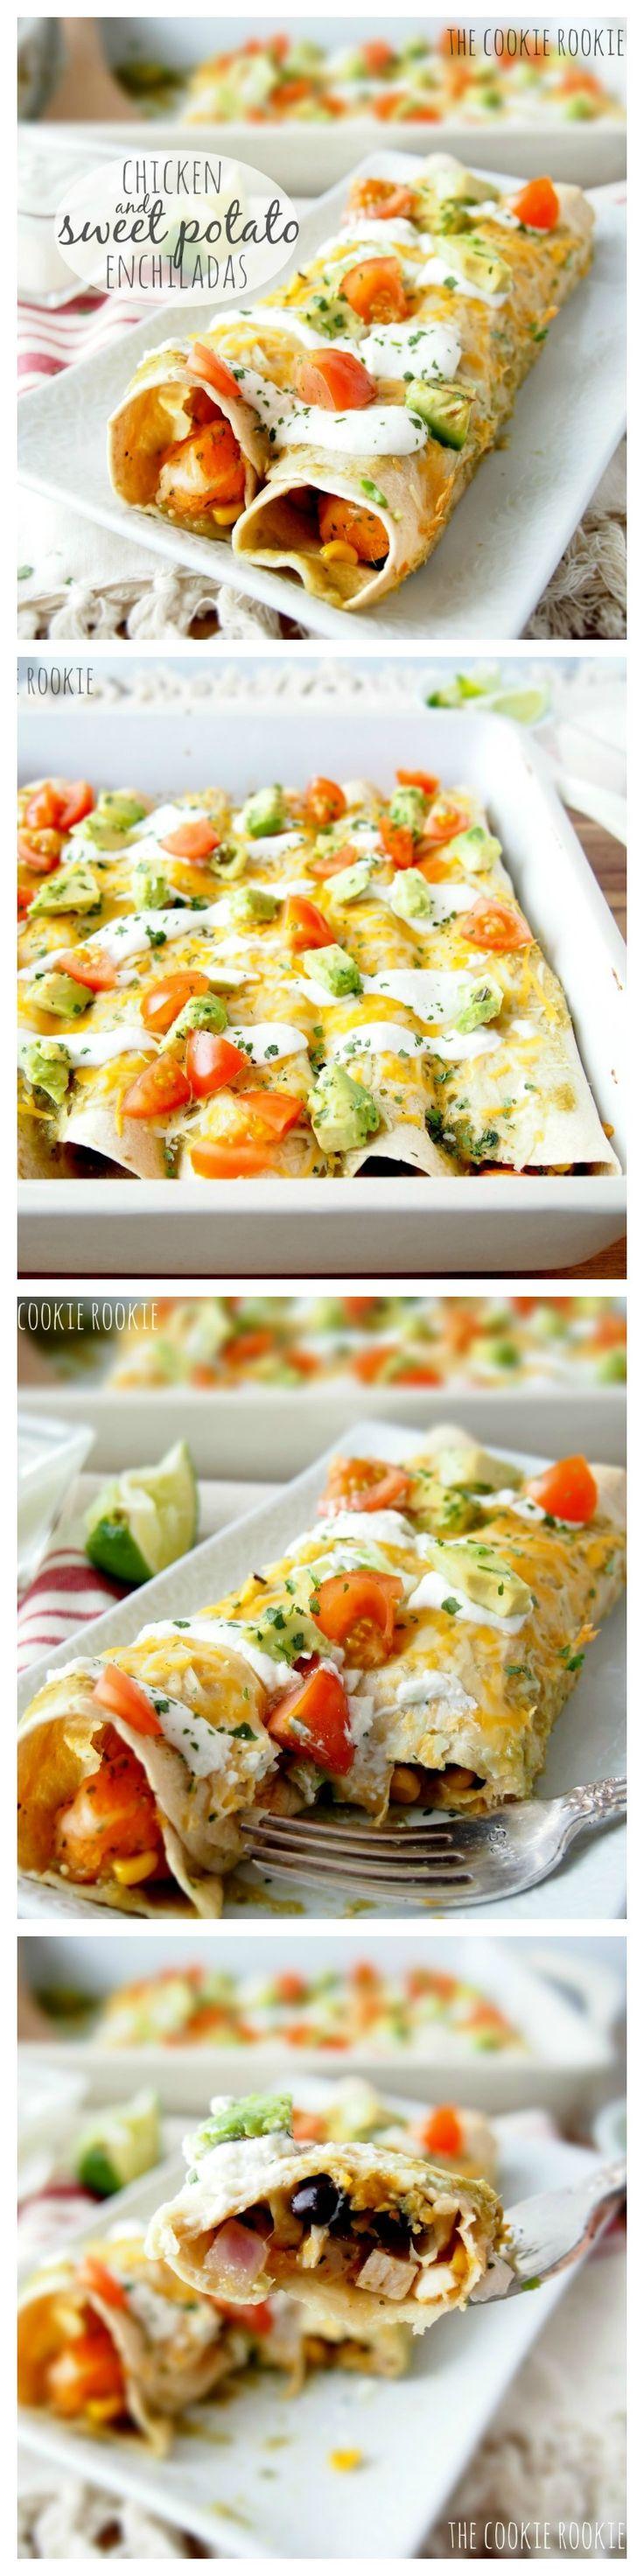 Chicken & Sweet Potato Enchiladas [ Vacupack.com ] #dinner #quality #fresh